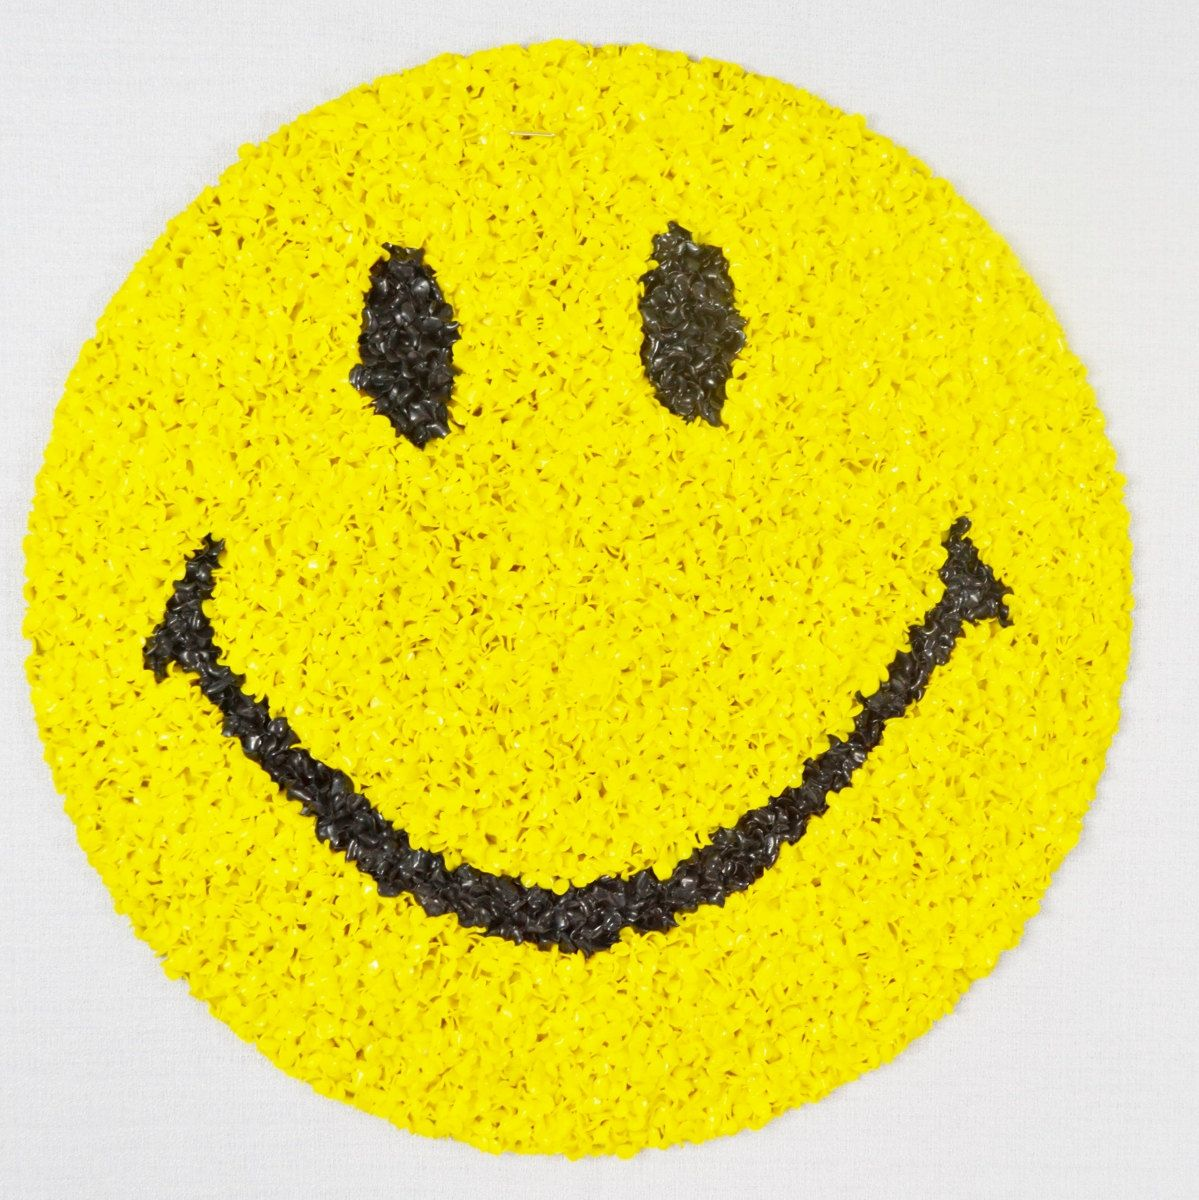 Vintage Smiley Face Yellow Black Plastic Popcorn Wall Decoration ...